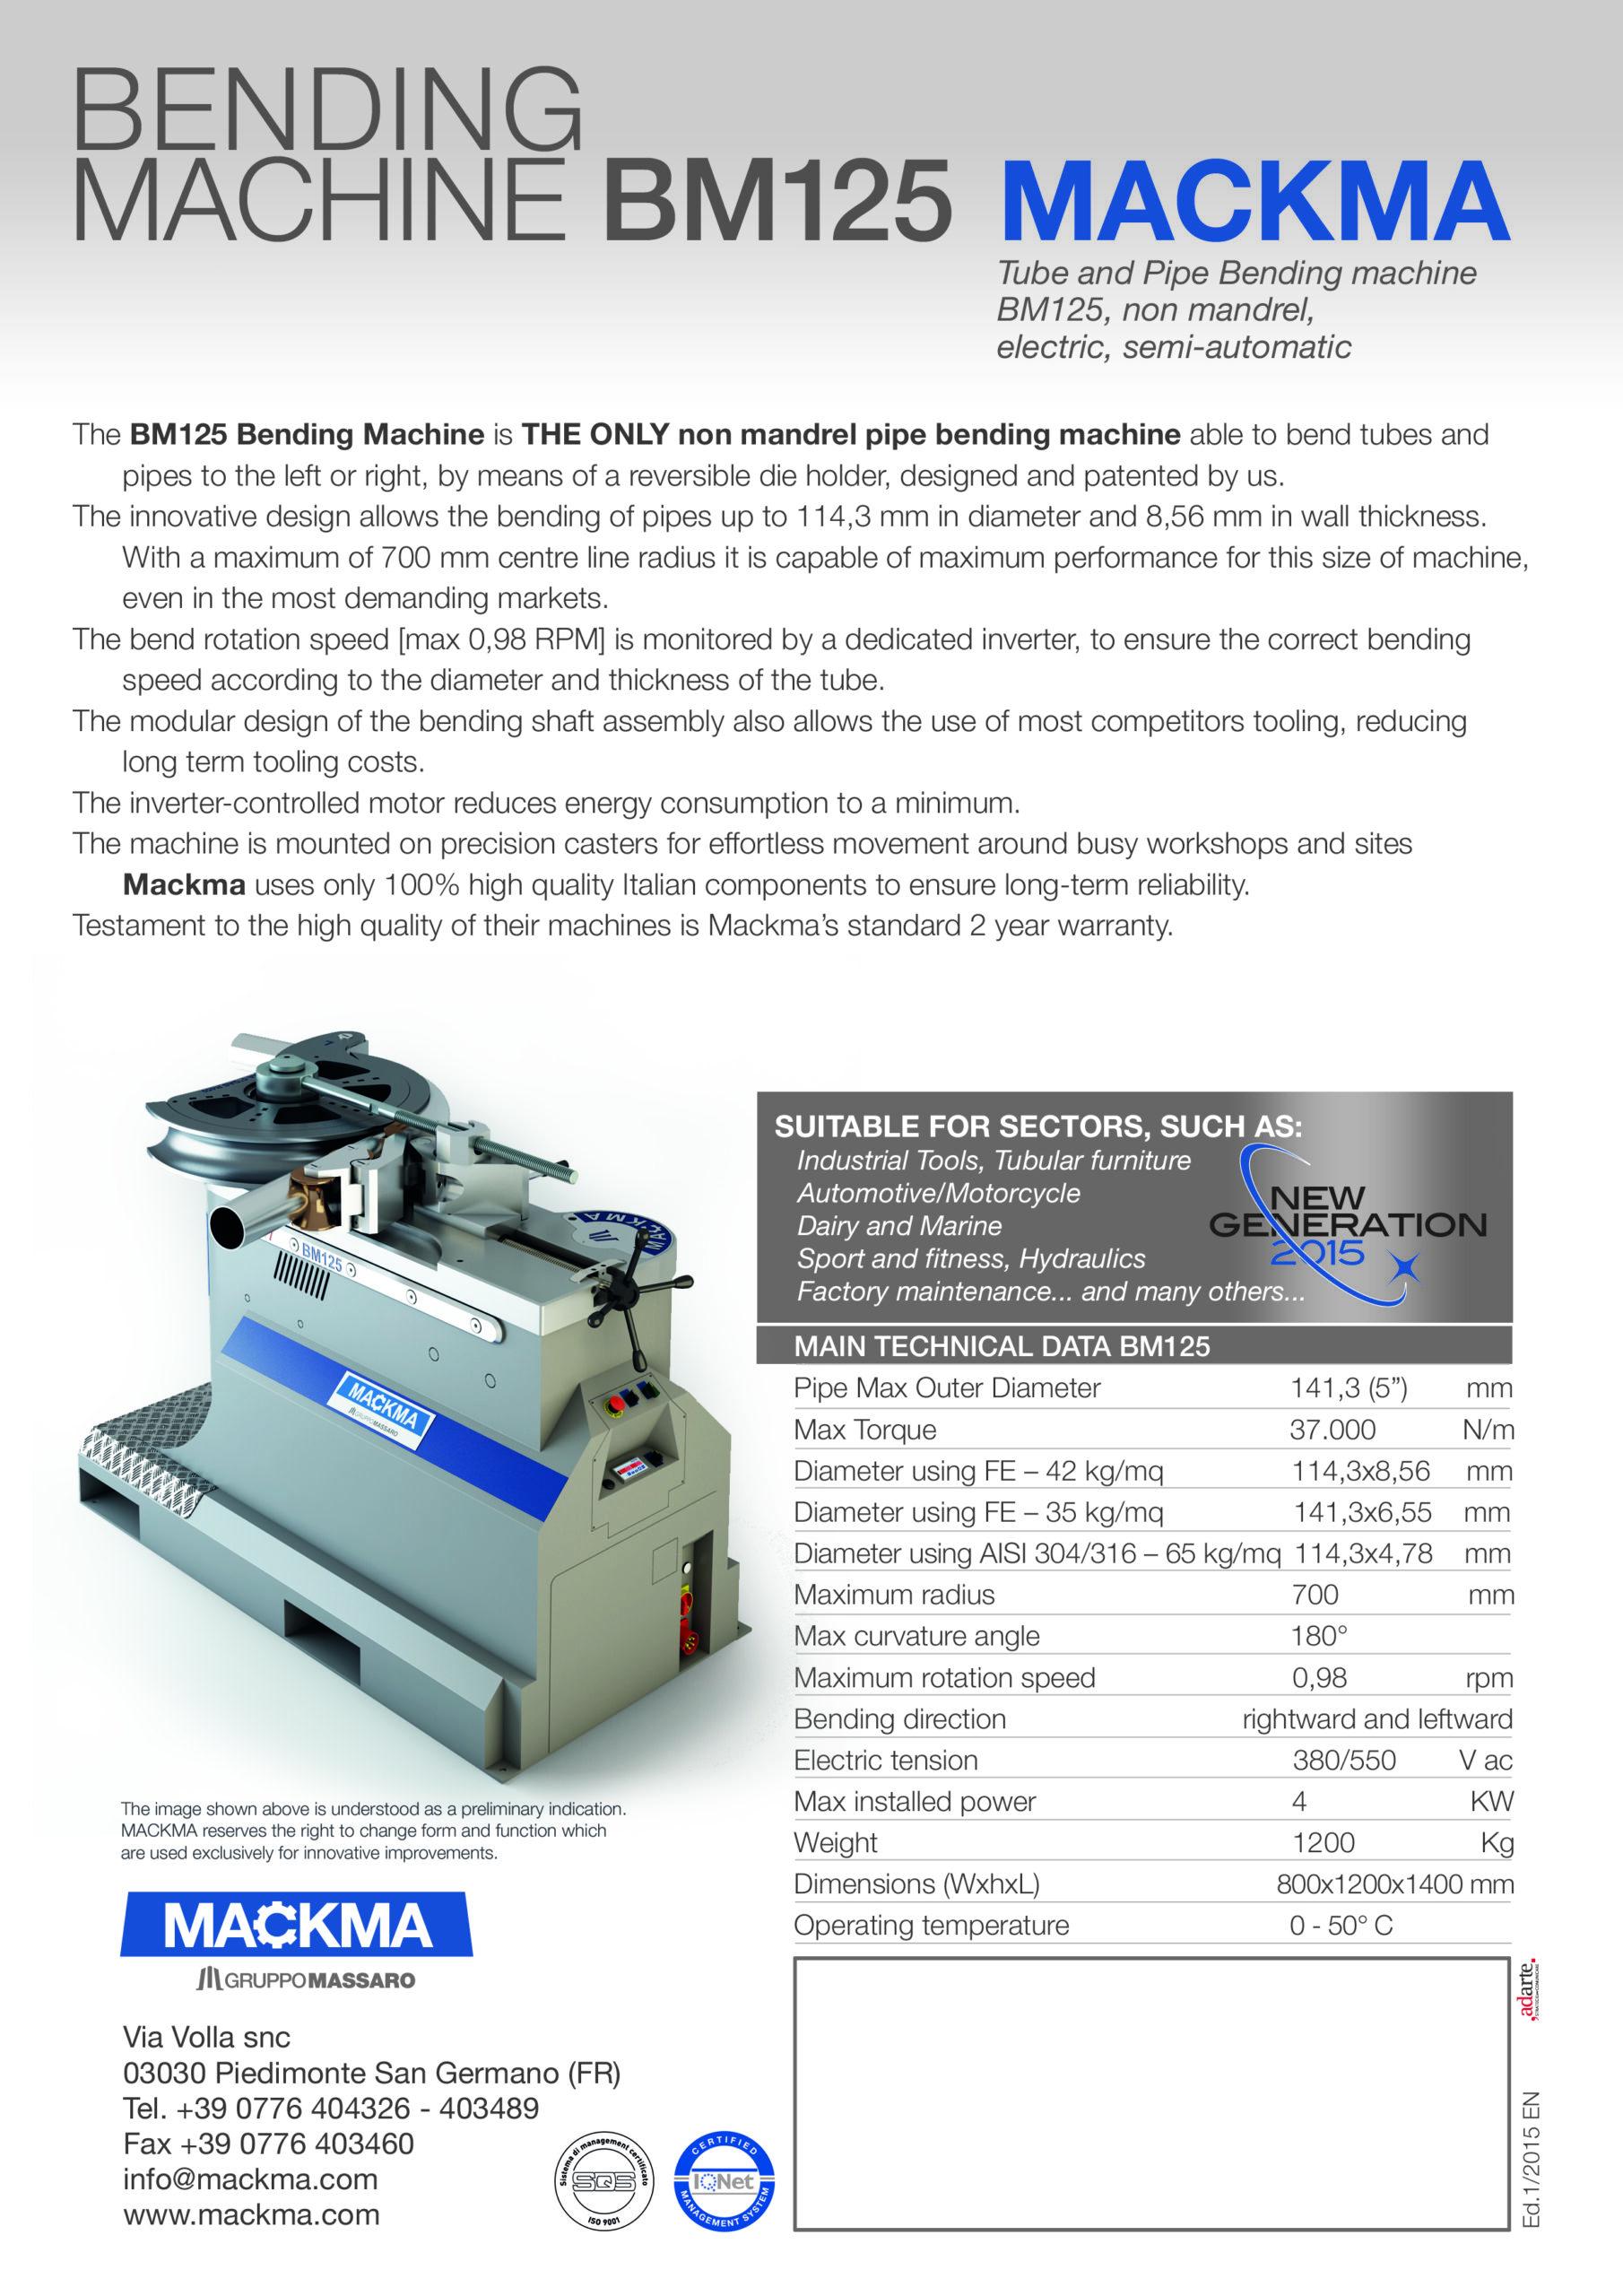 MACKMA - BM125 - Non Mandrel Tube & Pipe Bender